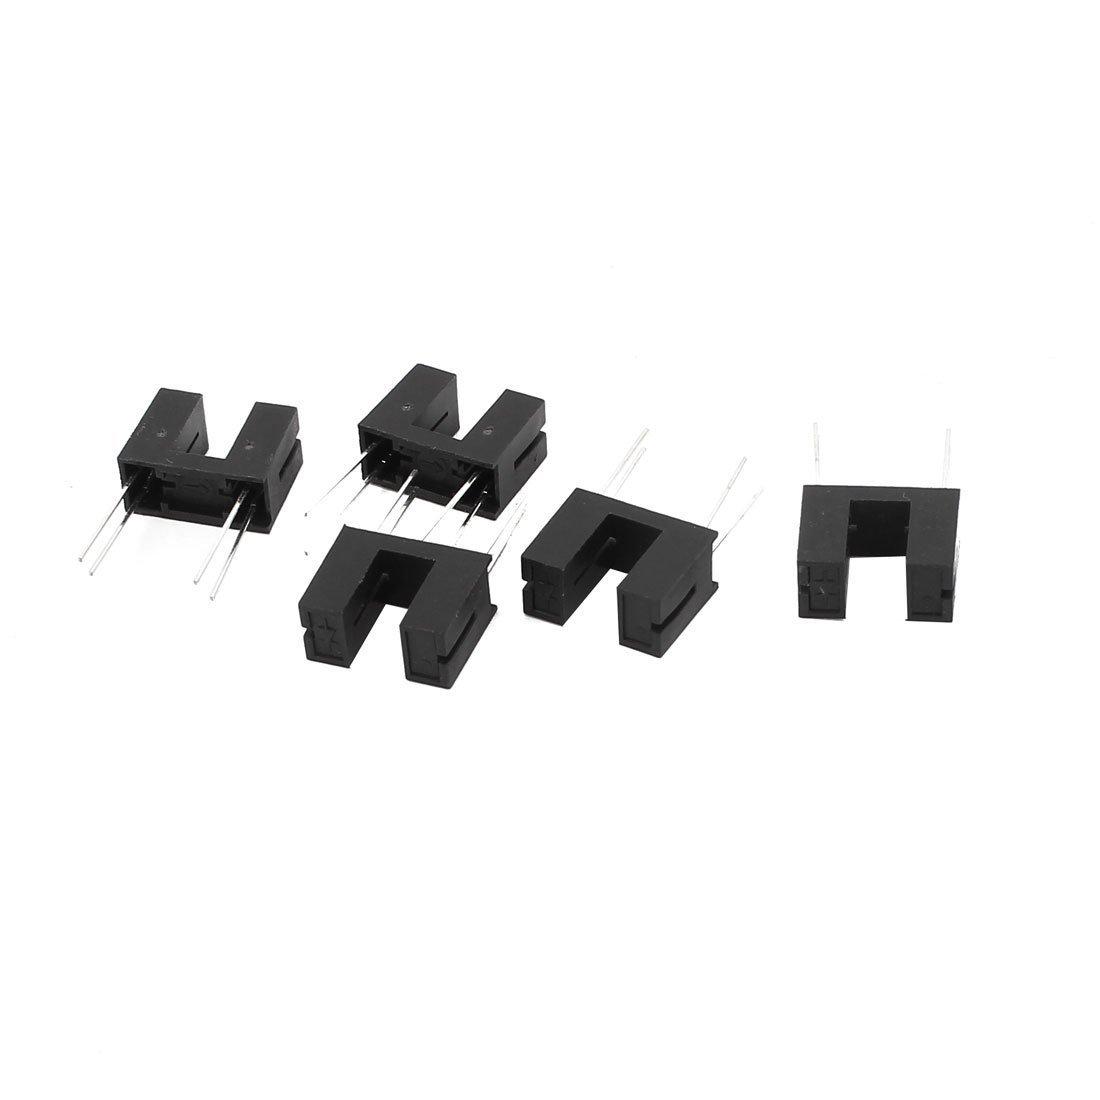 5 Pcs Itr9608 Itr 9608 4 Dip Switch Pin Opto Mm Slotted Diy Tools